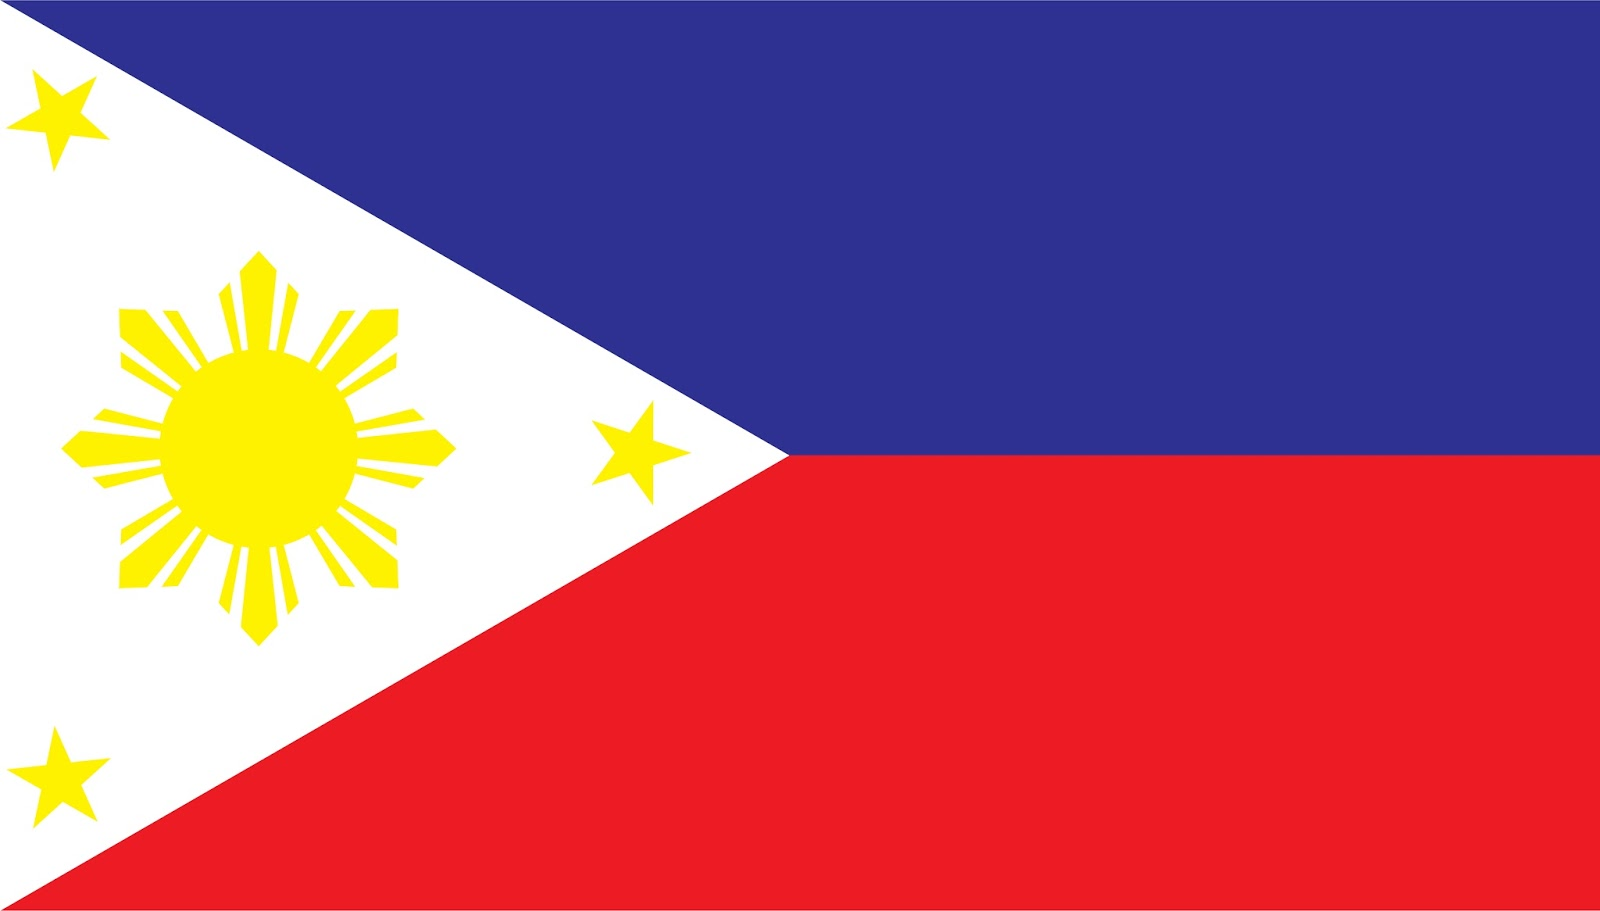 Imagehub: Philippines Flag HD Free Download